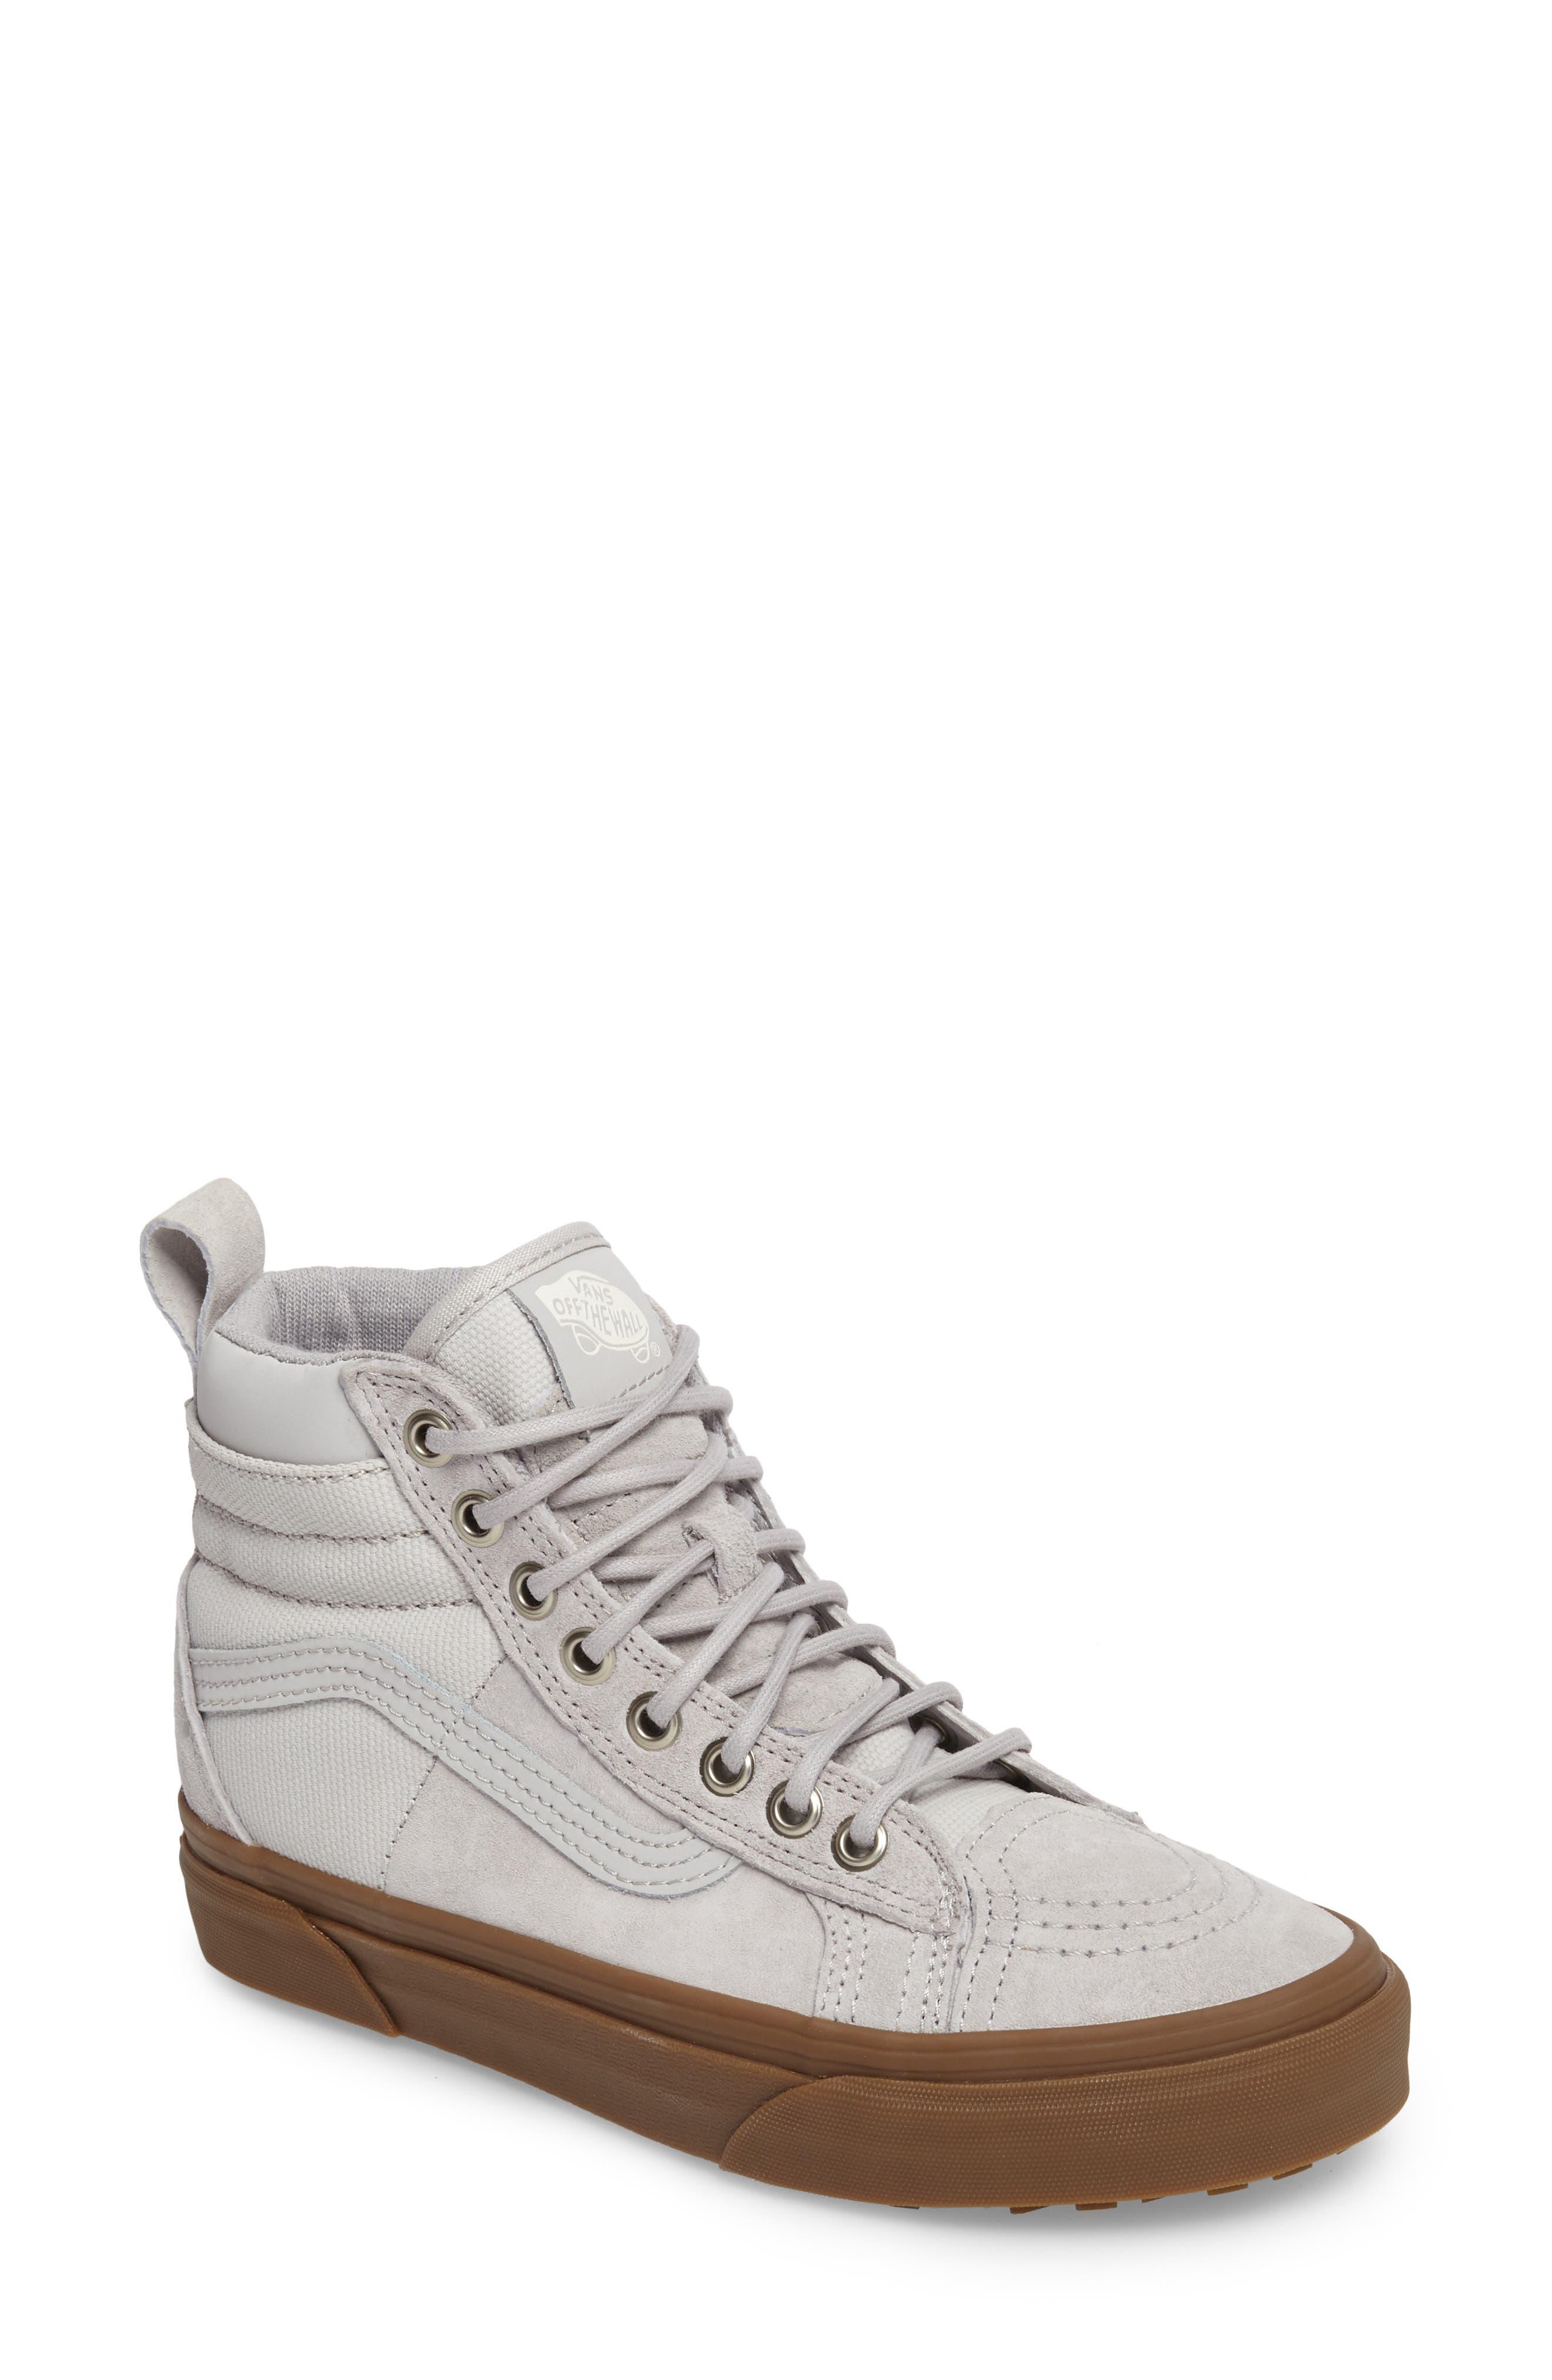 Sk8-Hi 46 MTE DX Sneaker,                             Main thumbnail 1, color,                             030